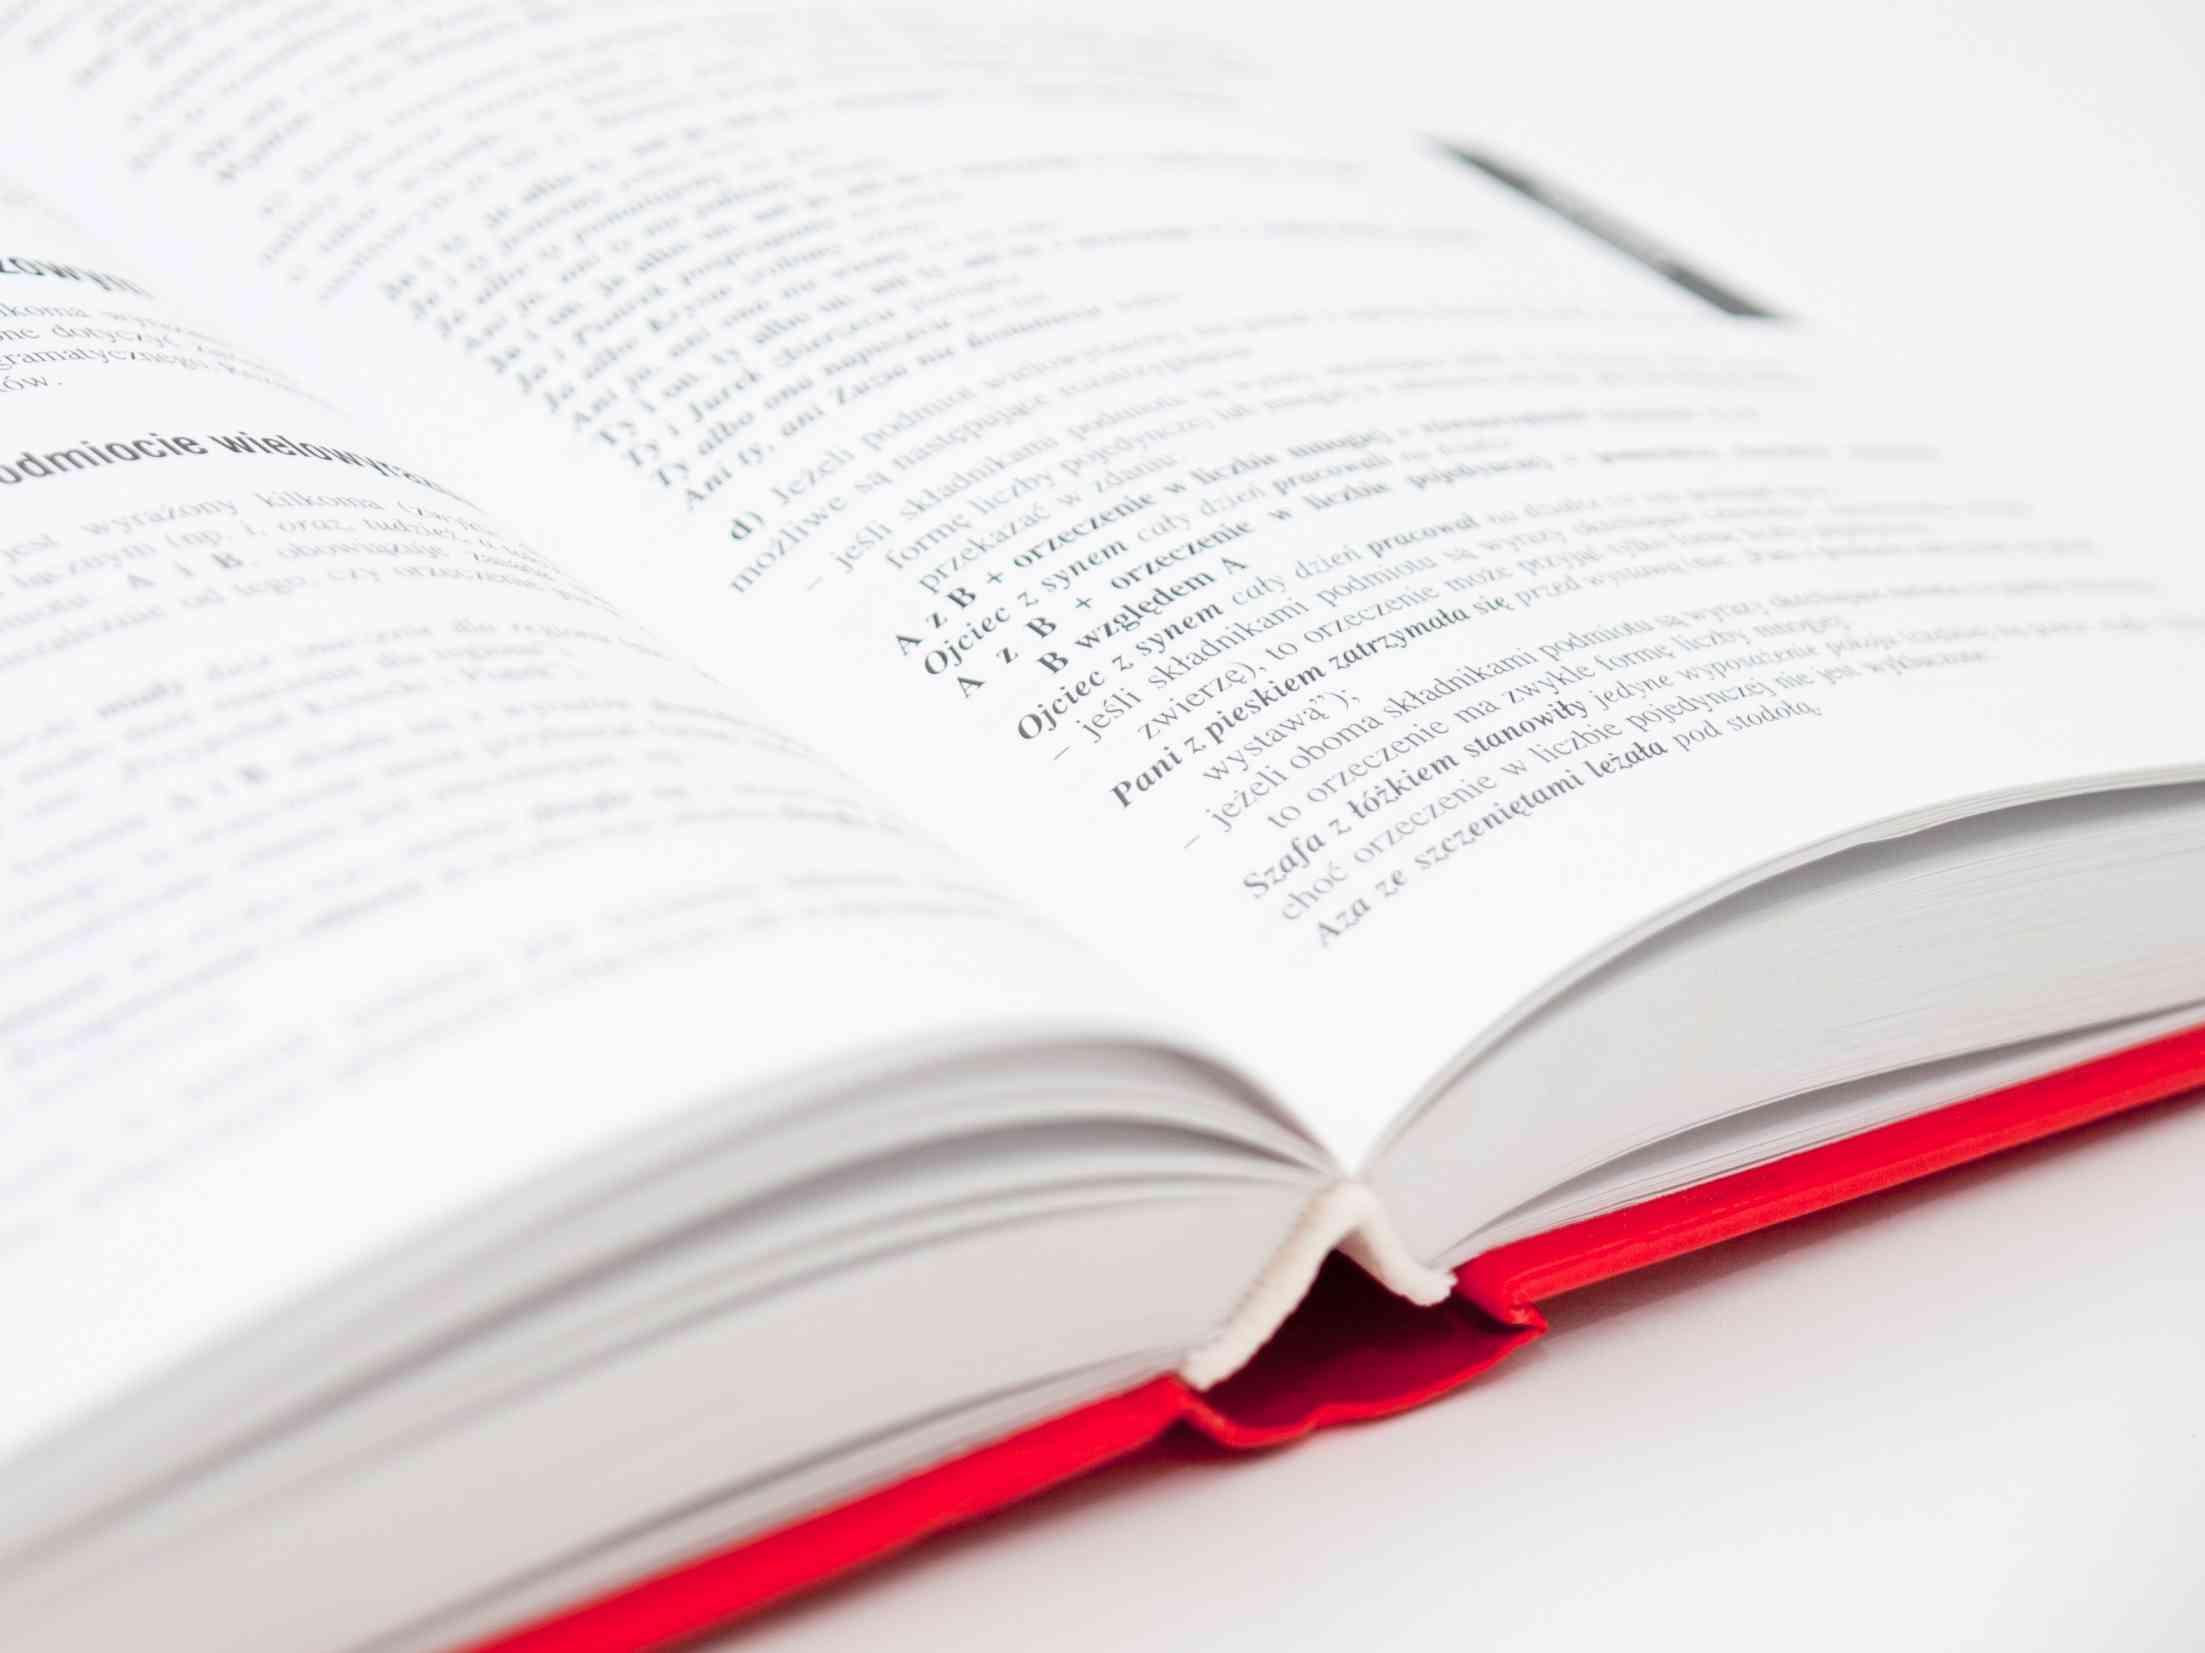 Shopify SEO Series 1: Keyword Research, Meta Titles and Blog